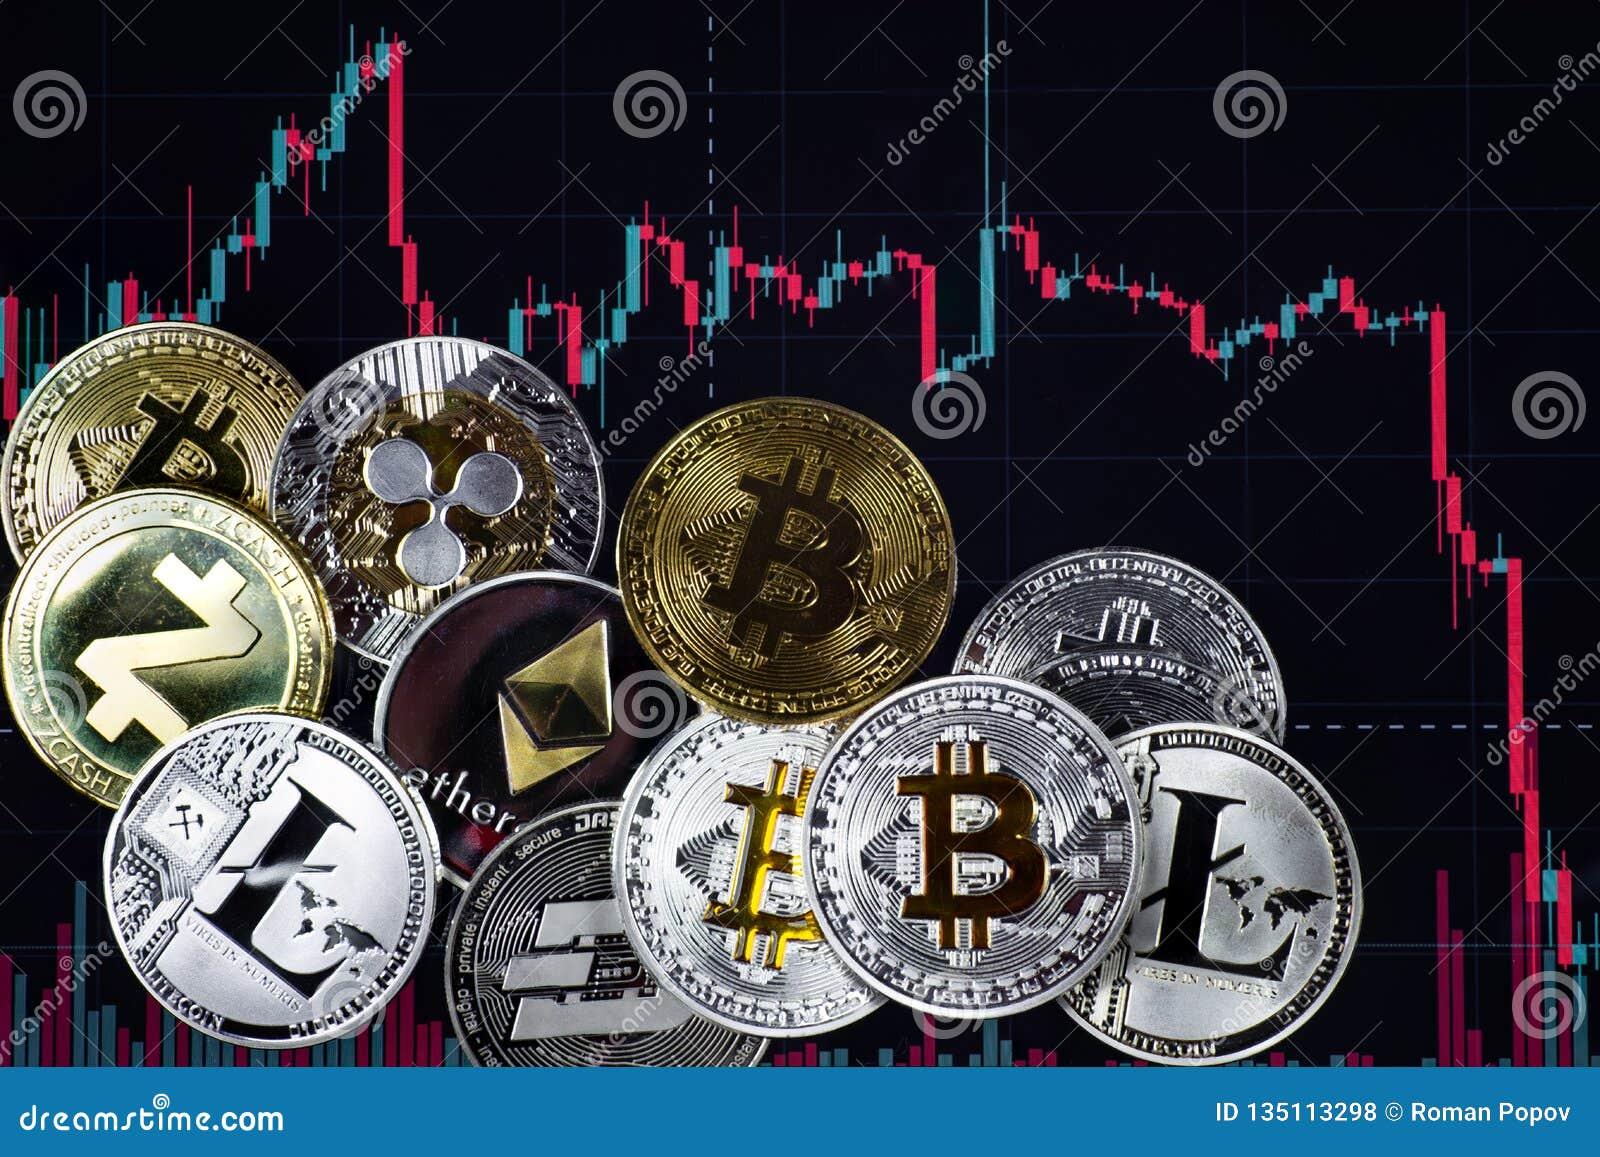 Etherium νομισμάτων, bitcoin, εξόρμηση, litecoin, κυματισμός, zcash στα πλαίσια του μειωμένου διαγράμματος ανταλλαγής